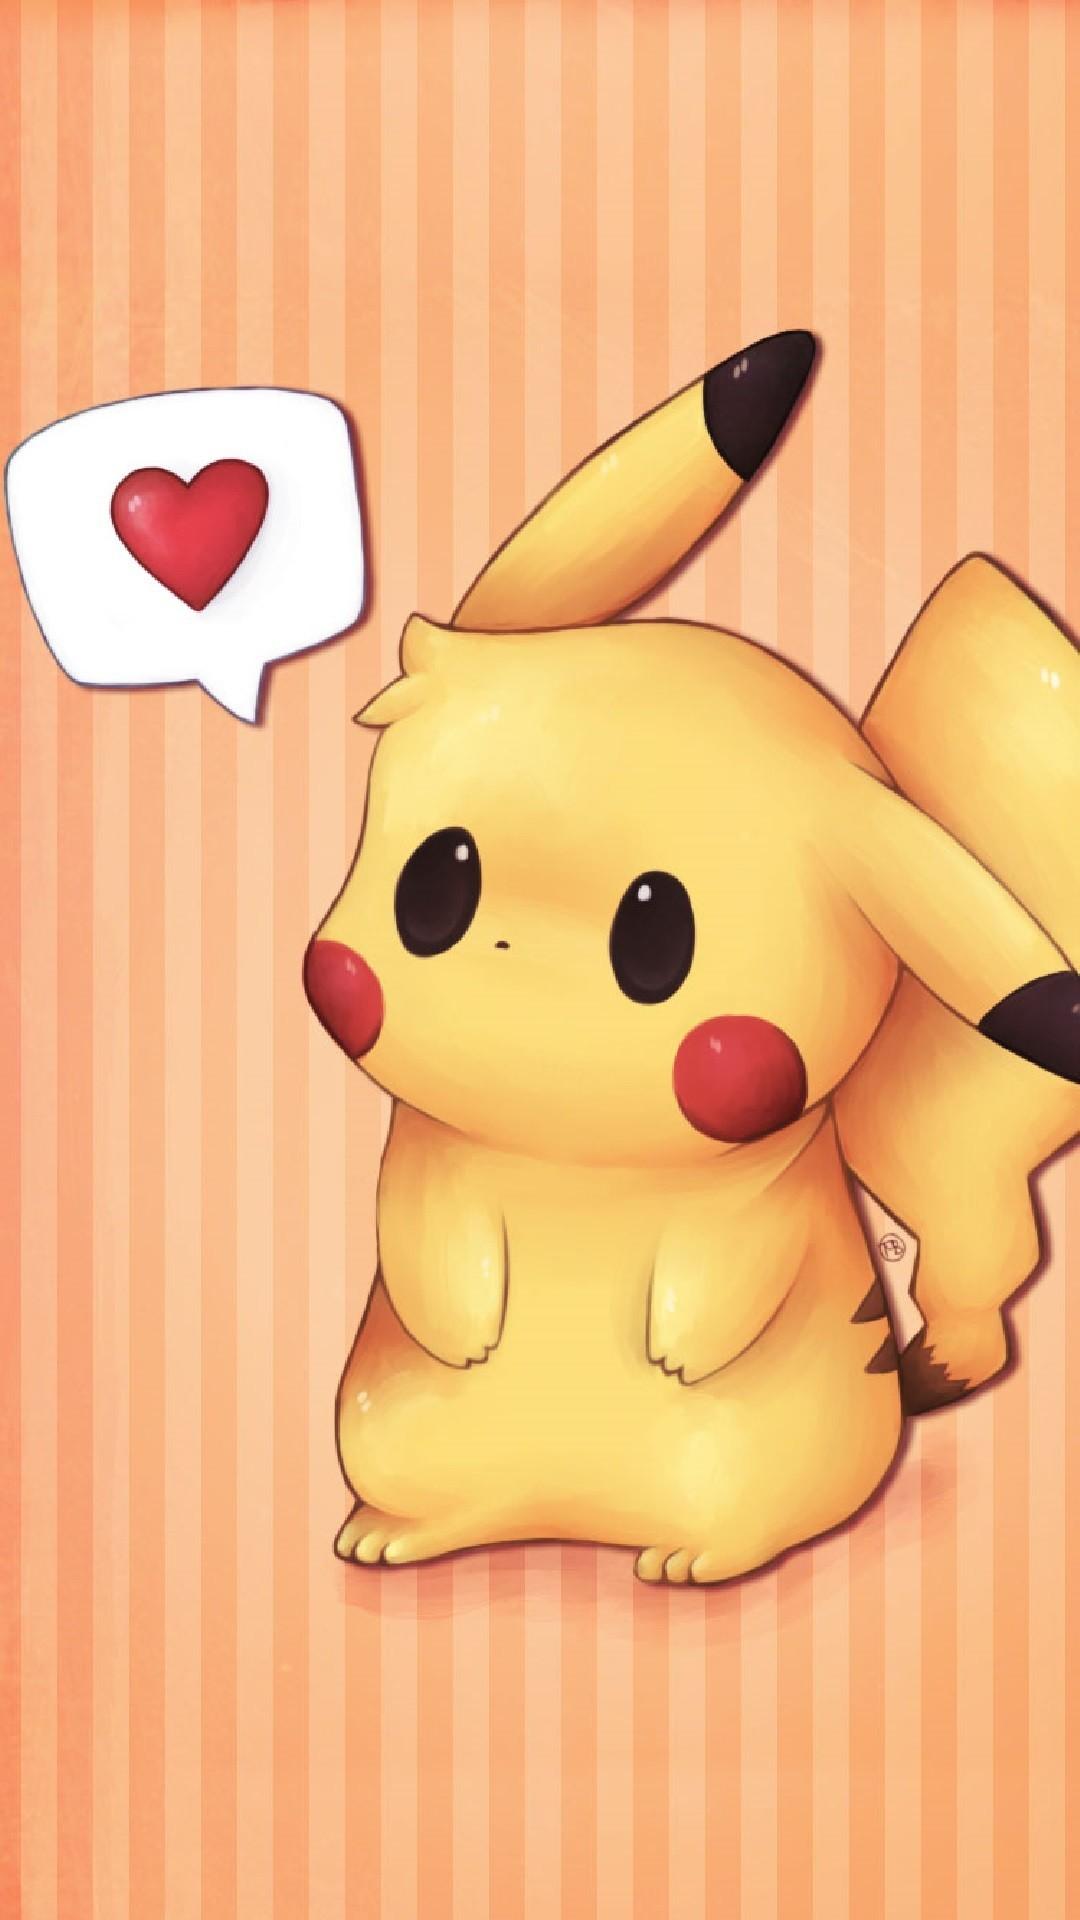 Love Pikachu Wallpaper   KoLPaPer   Awesome HD Wallpapers 1080x1920